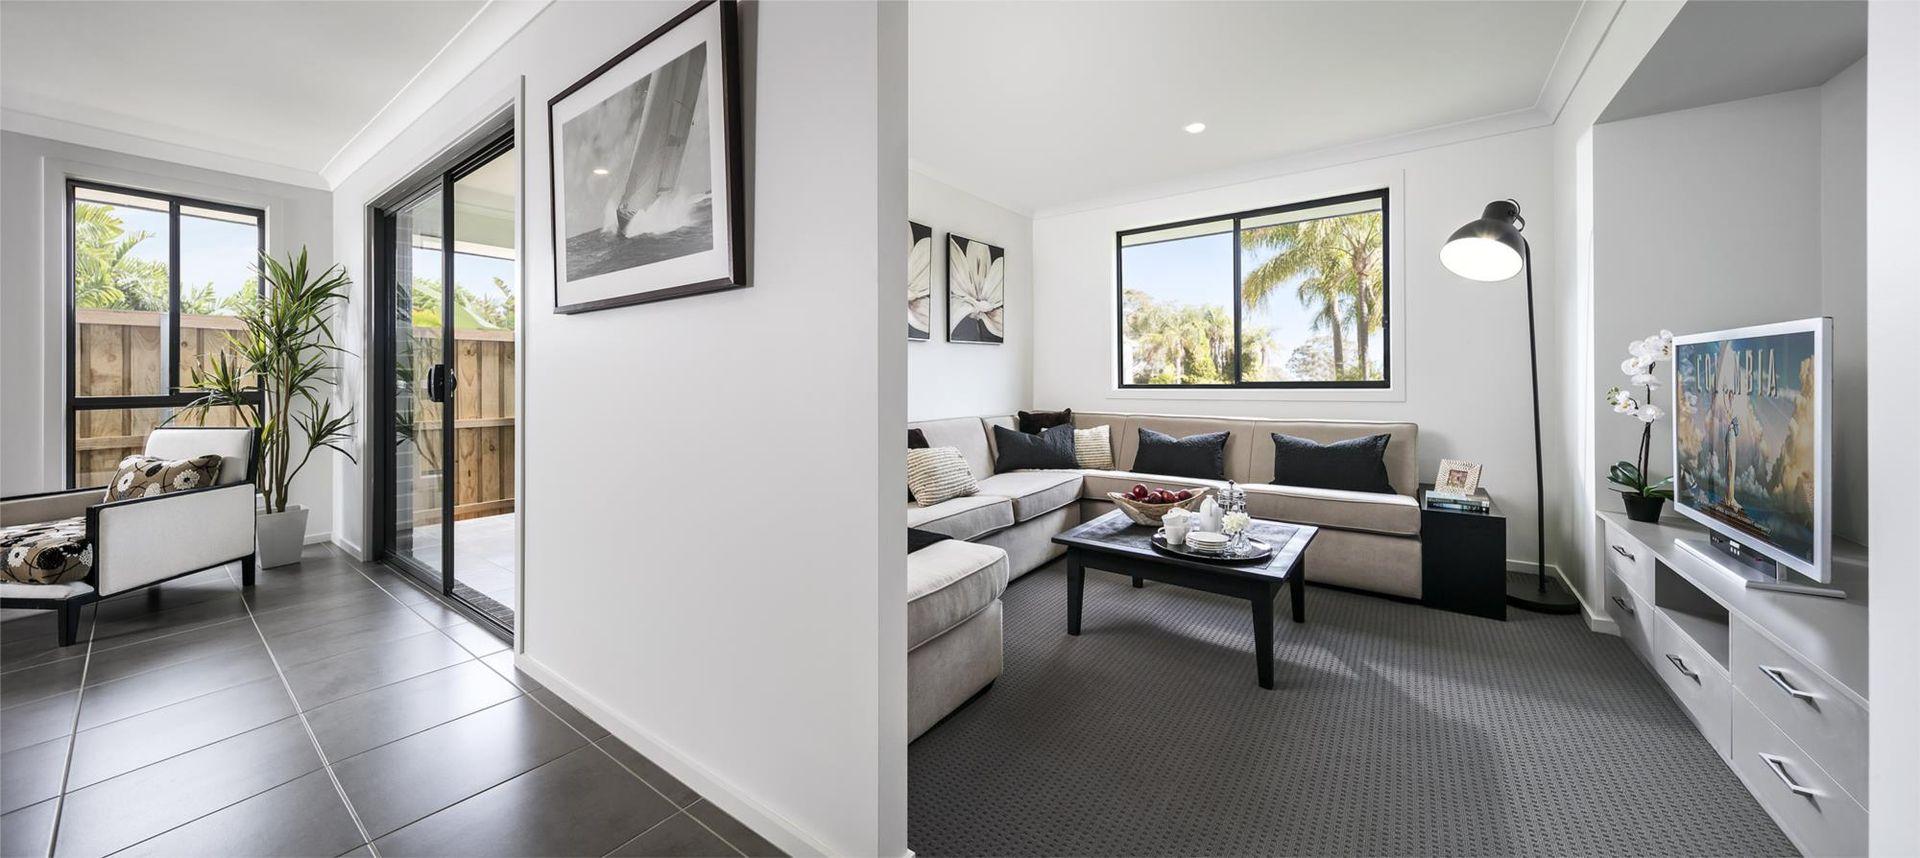 Lot 6082 Elkhorn Street, Marsden Park NSW 2765, Image 2